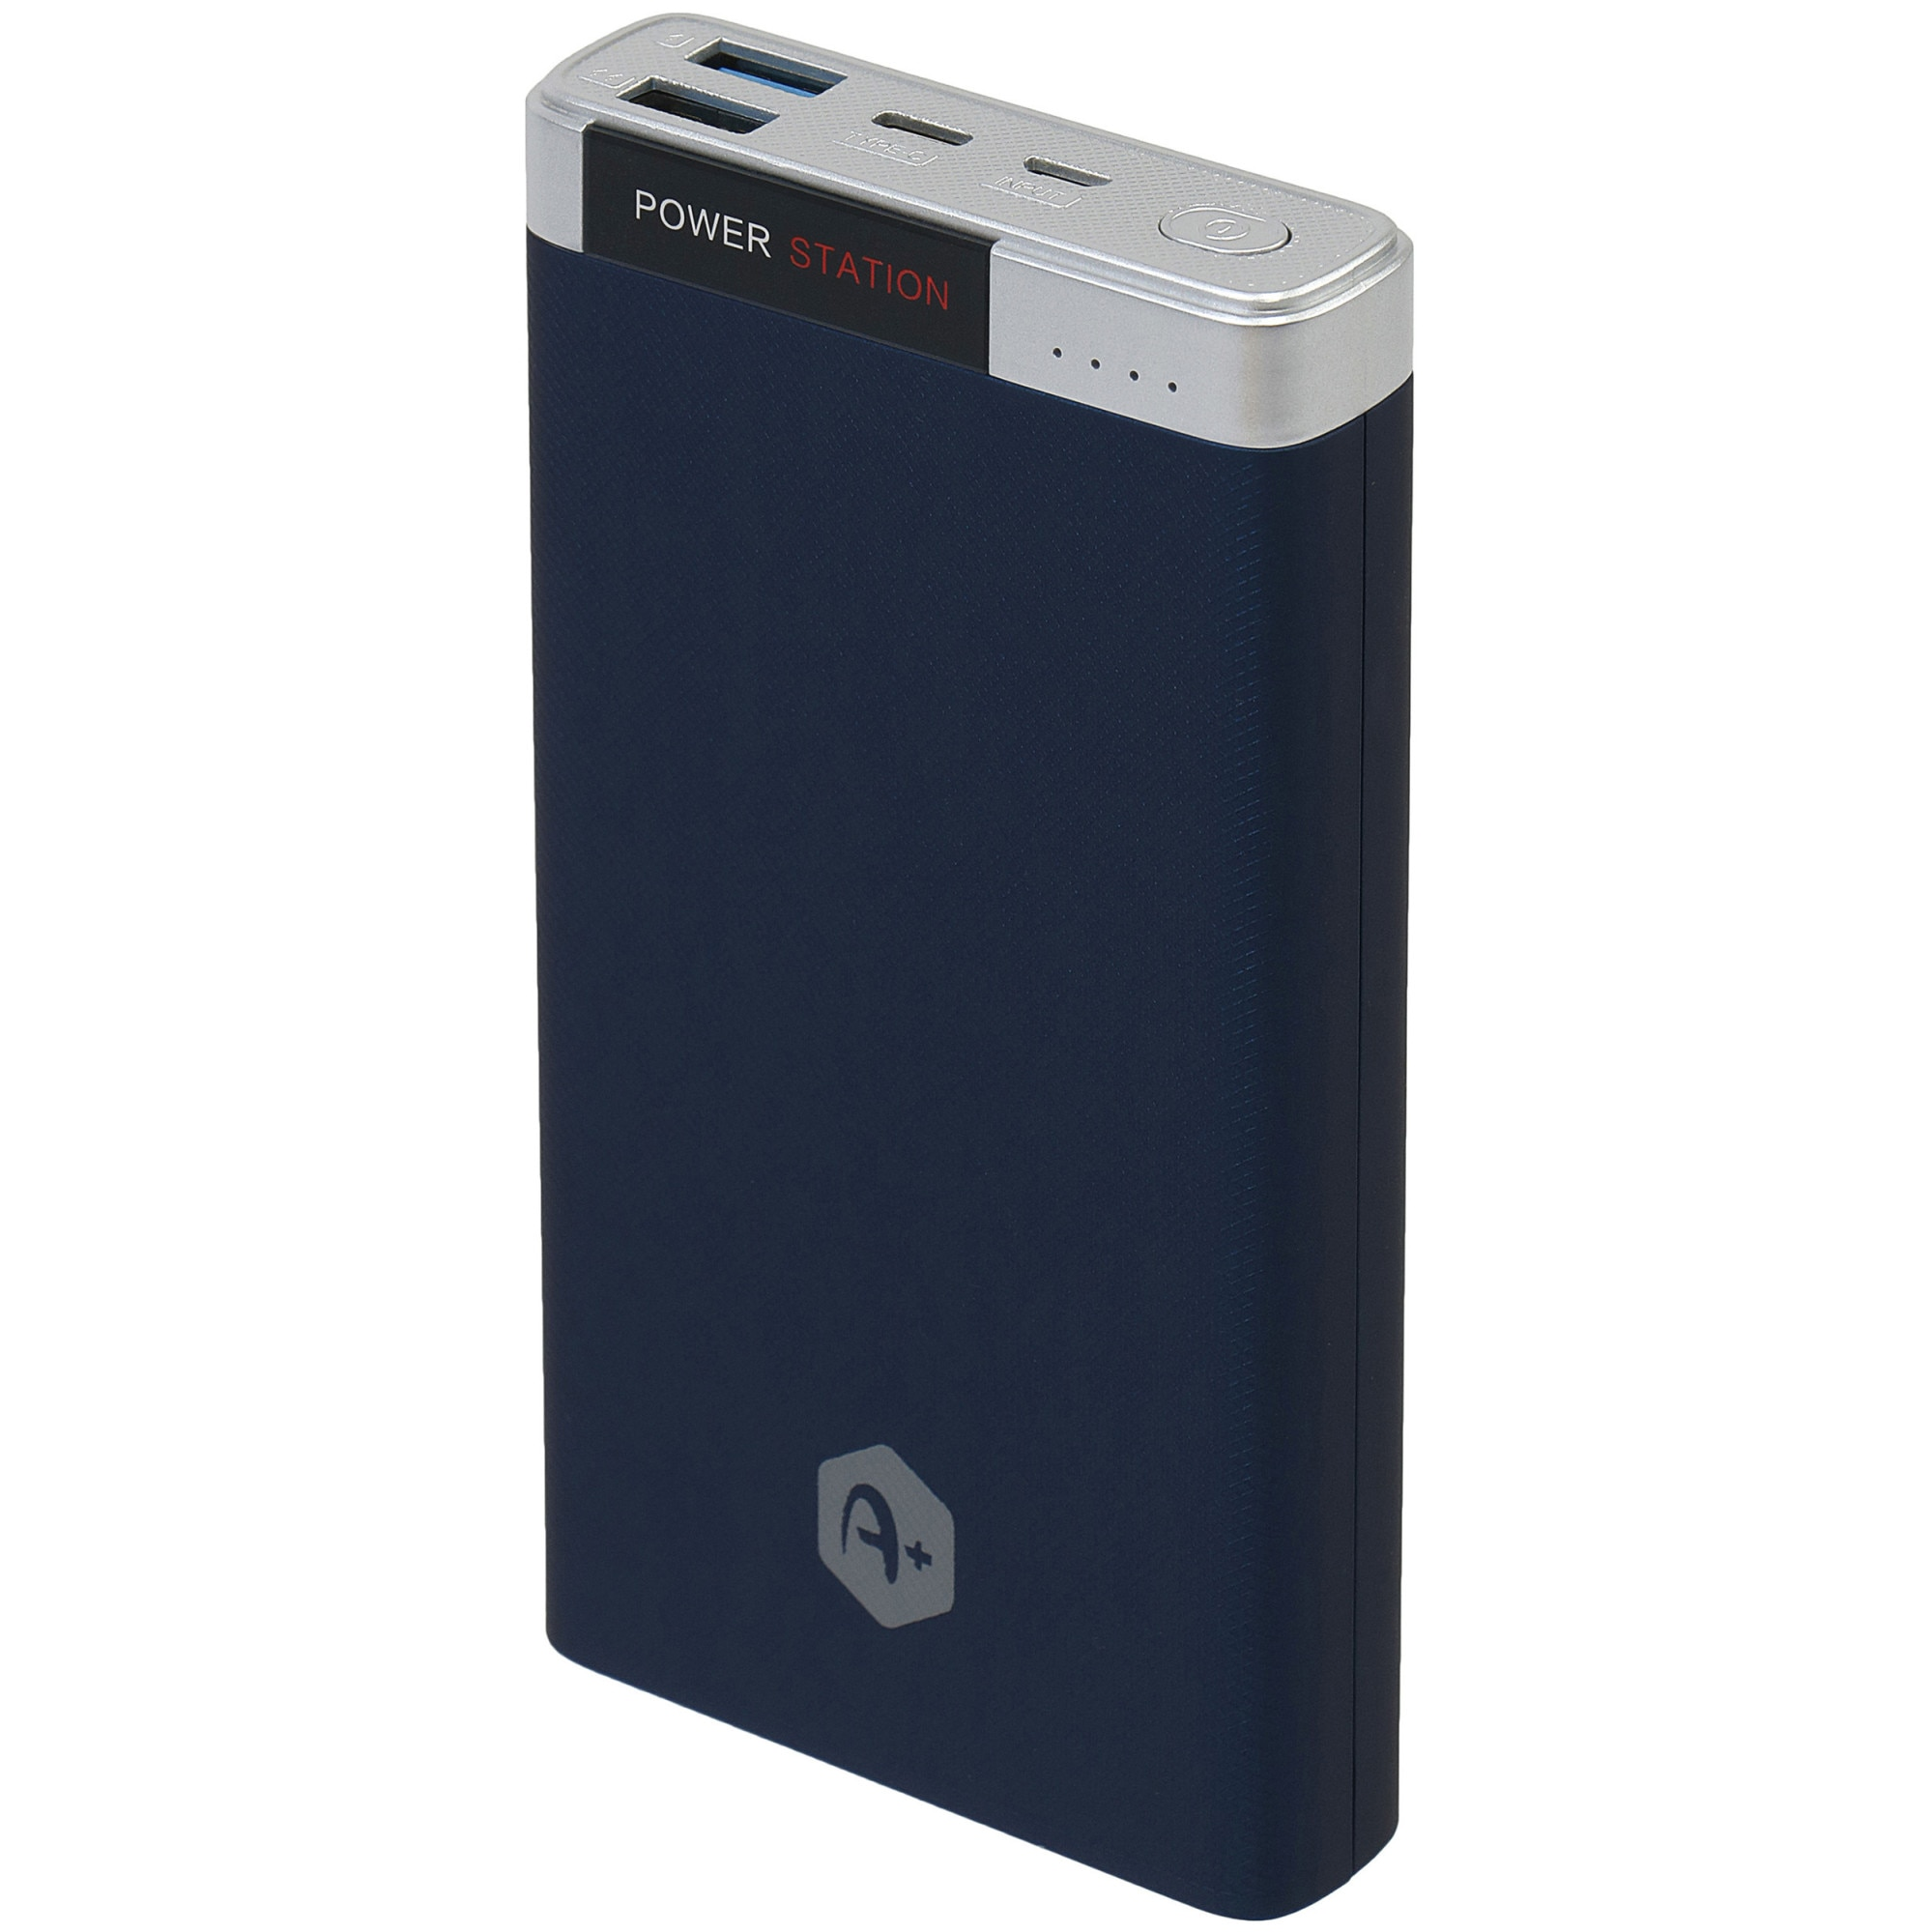 Fotografie Acumulator extern A+, 20.000 mAh Quick Charge 3.0, 2 porturi USB, conectivitate micro USB si type C, Blue